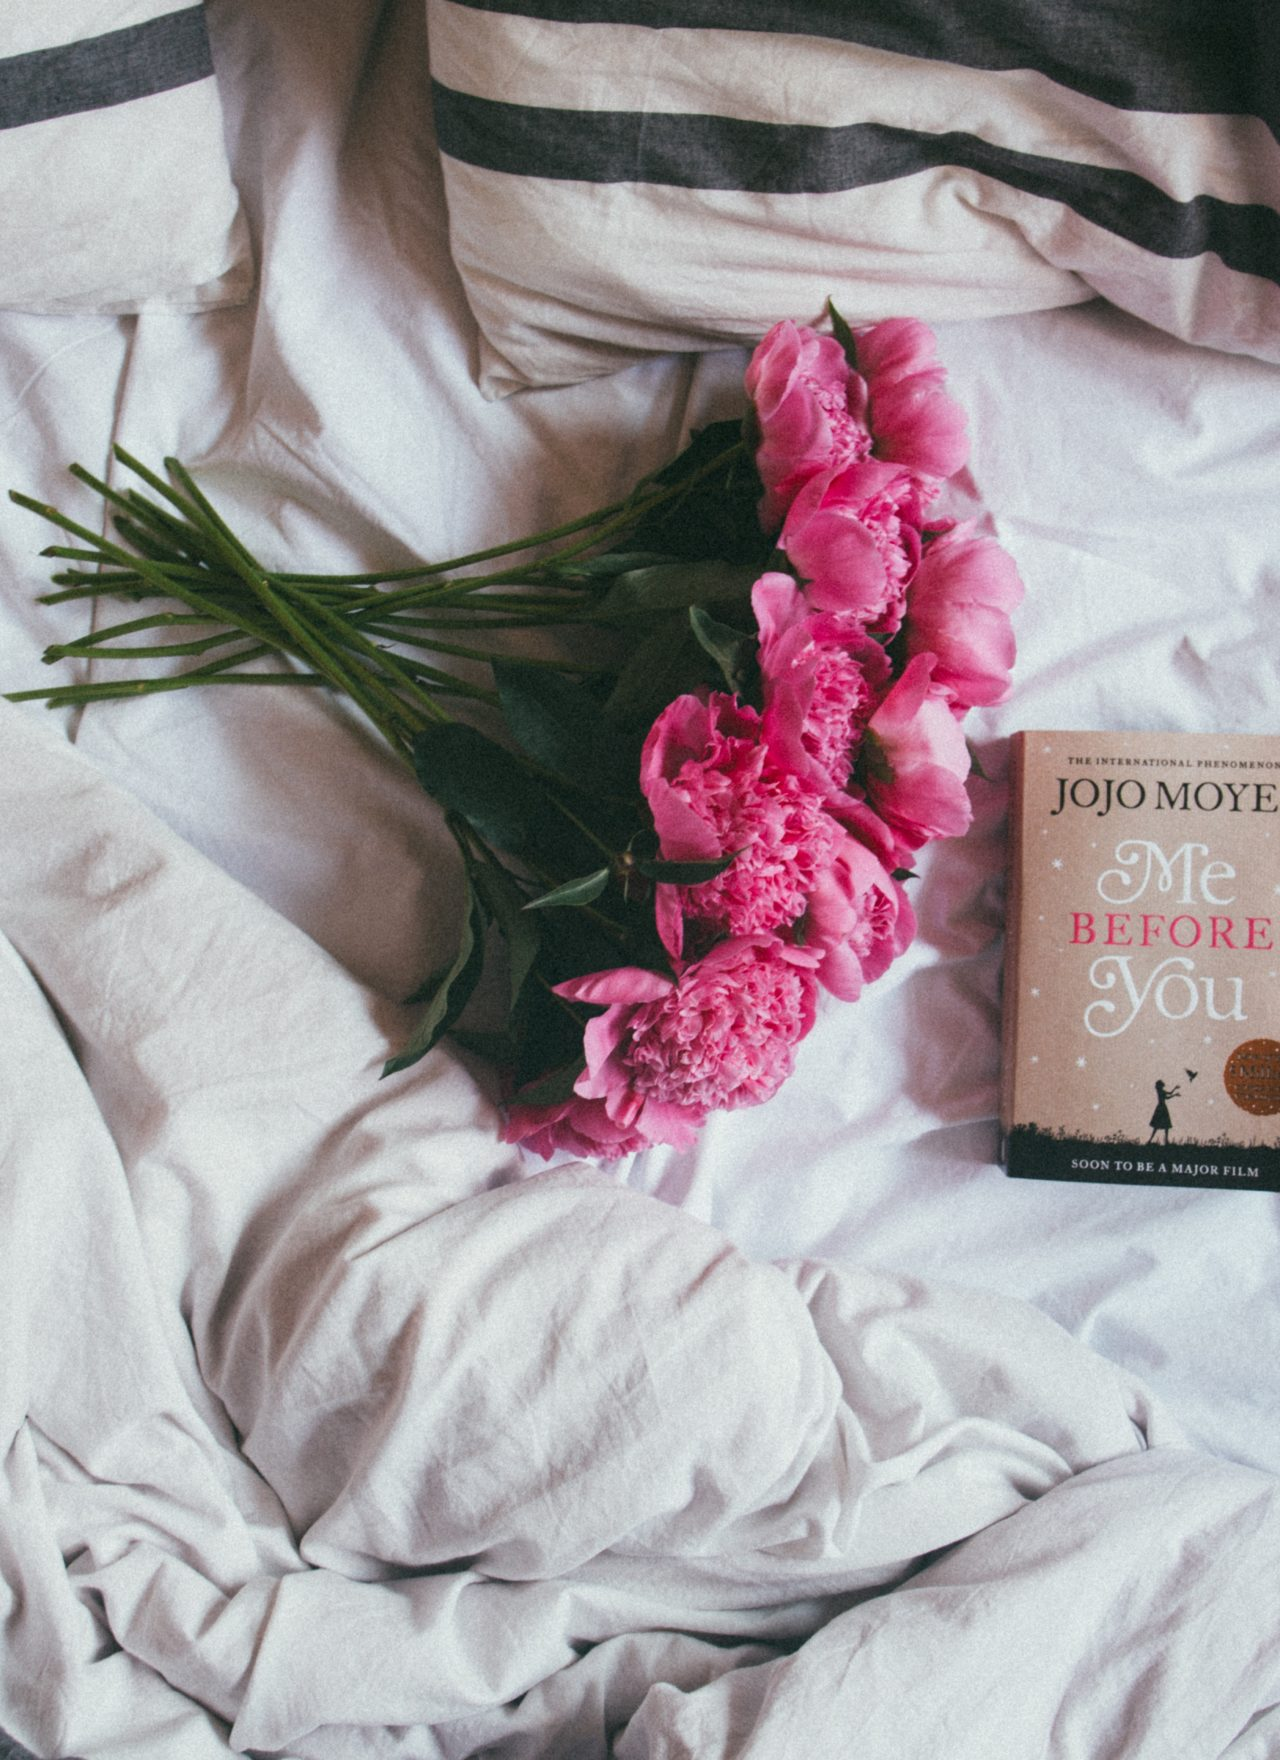 31 Best Sleep Products to Sleep Better Every Night